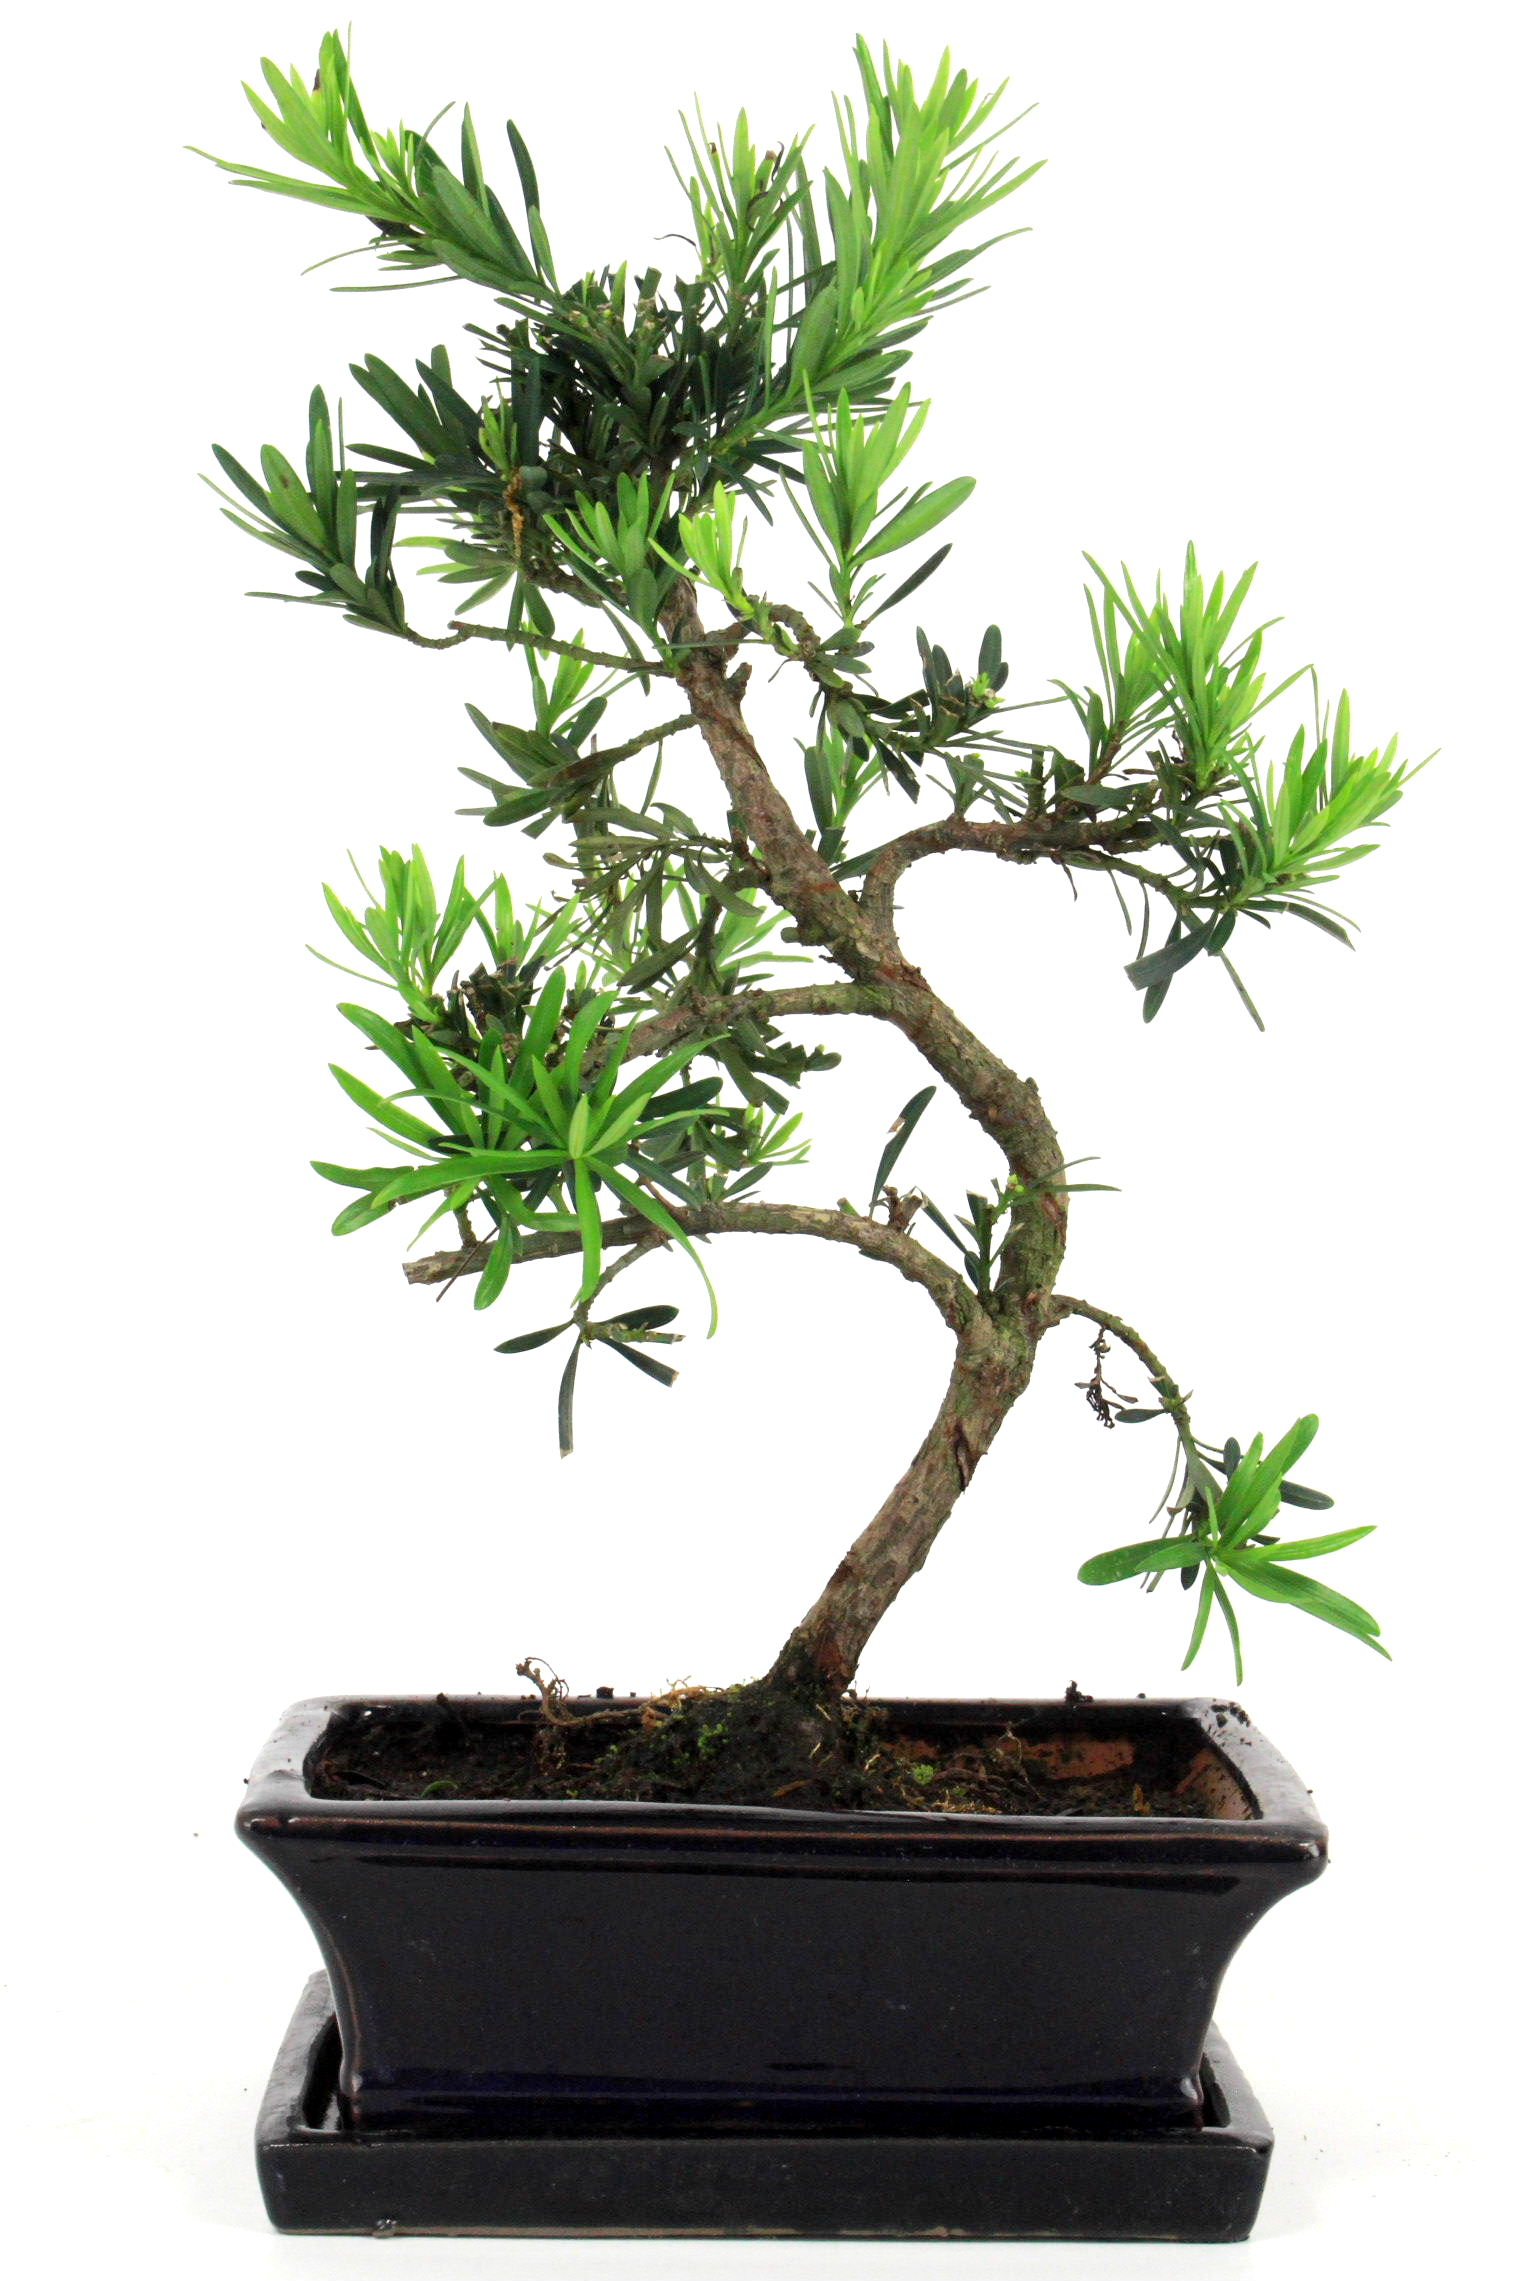 steineibe bonsai 35 40 cm 1912 bei oyaki bonsai kaufen. Black Bedroom Furniture Sets. Home Design Ideas